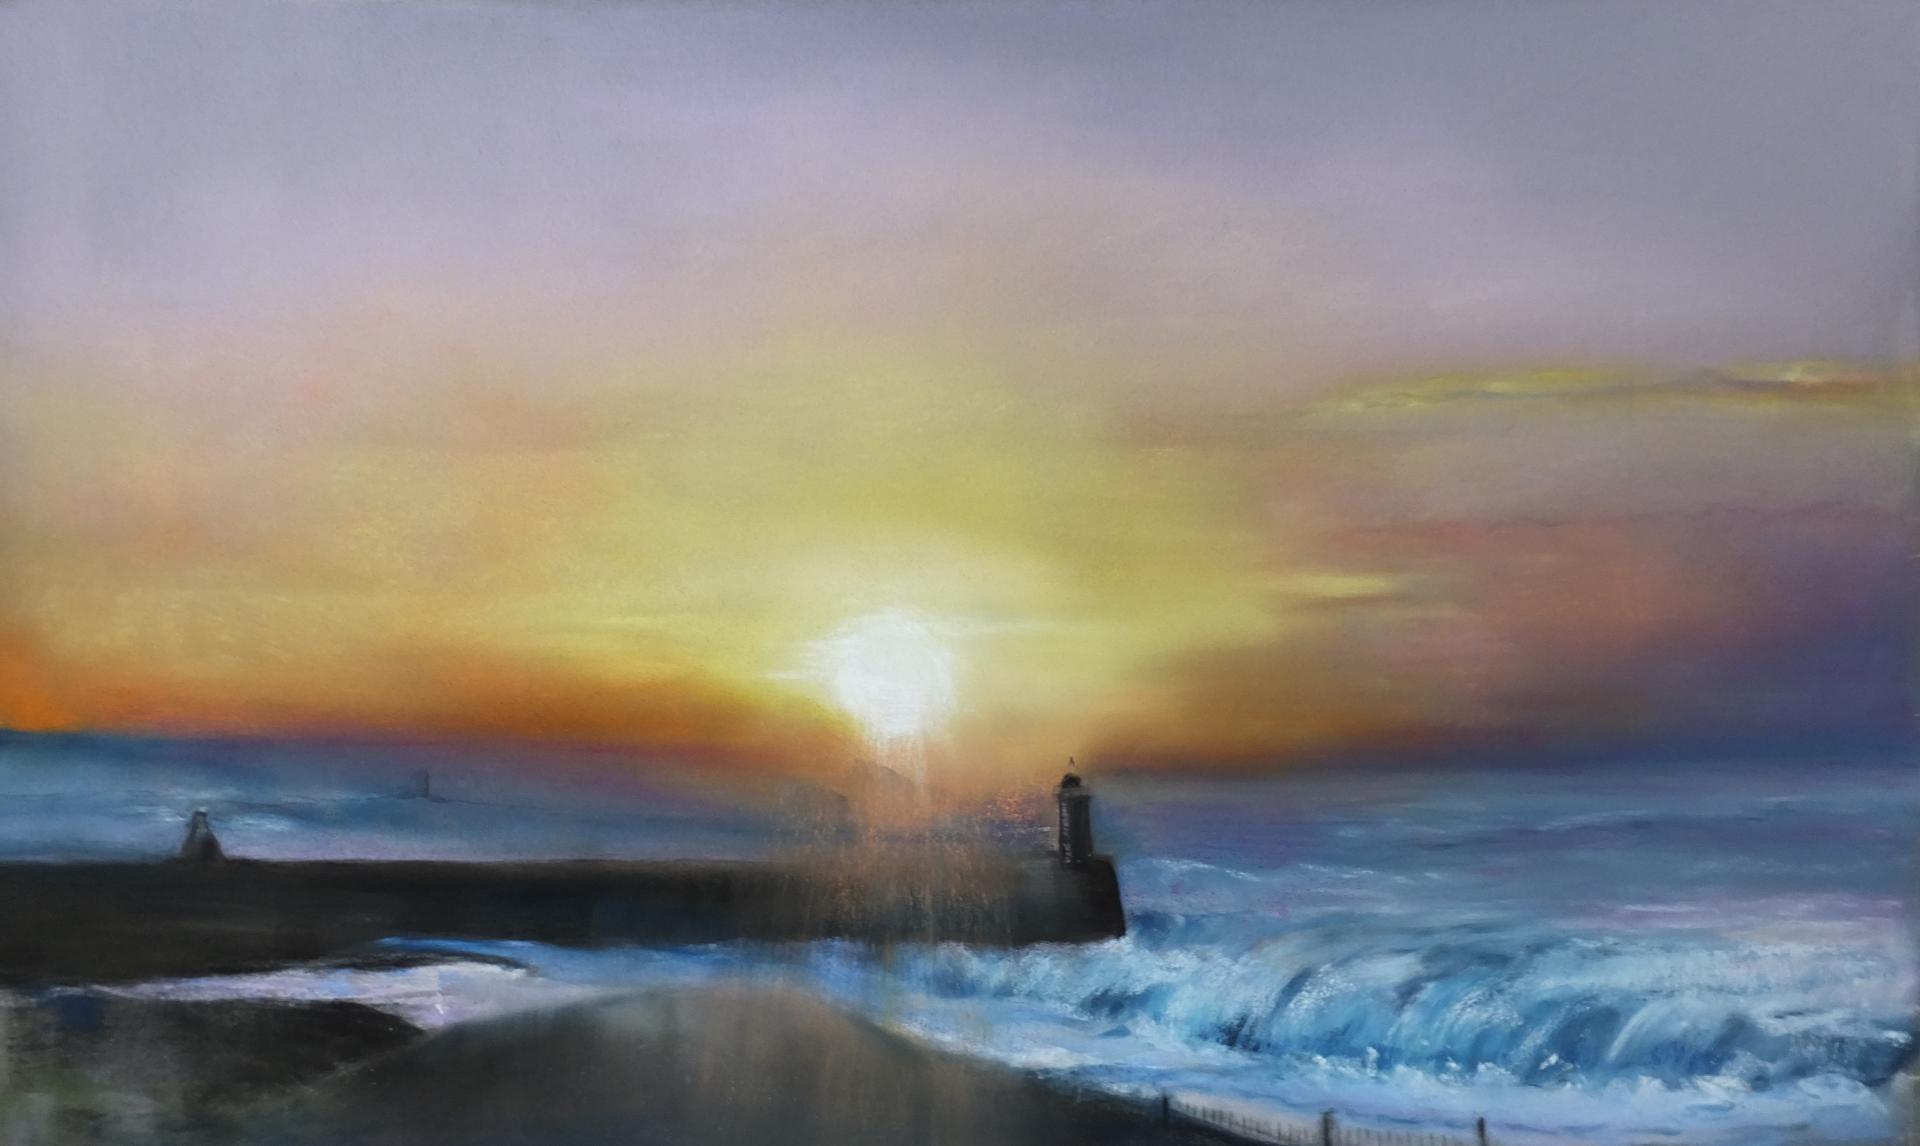 Le phare de Raoulic